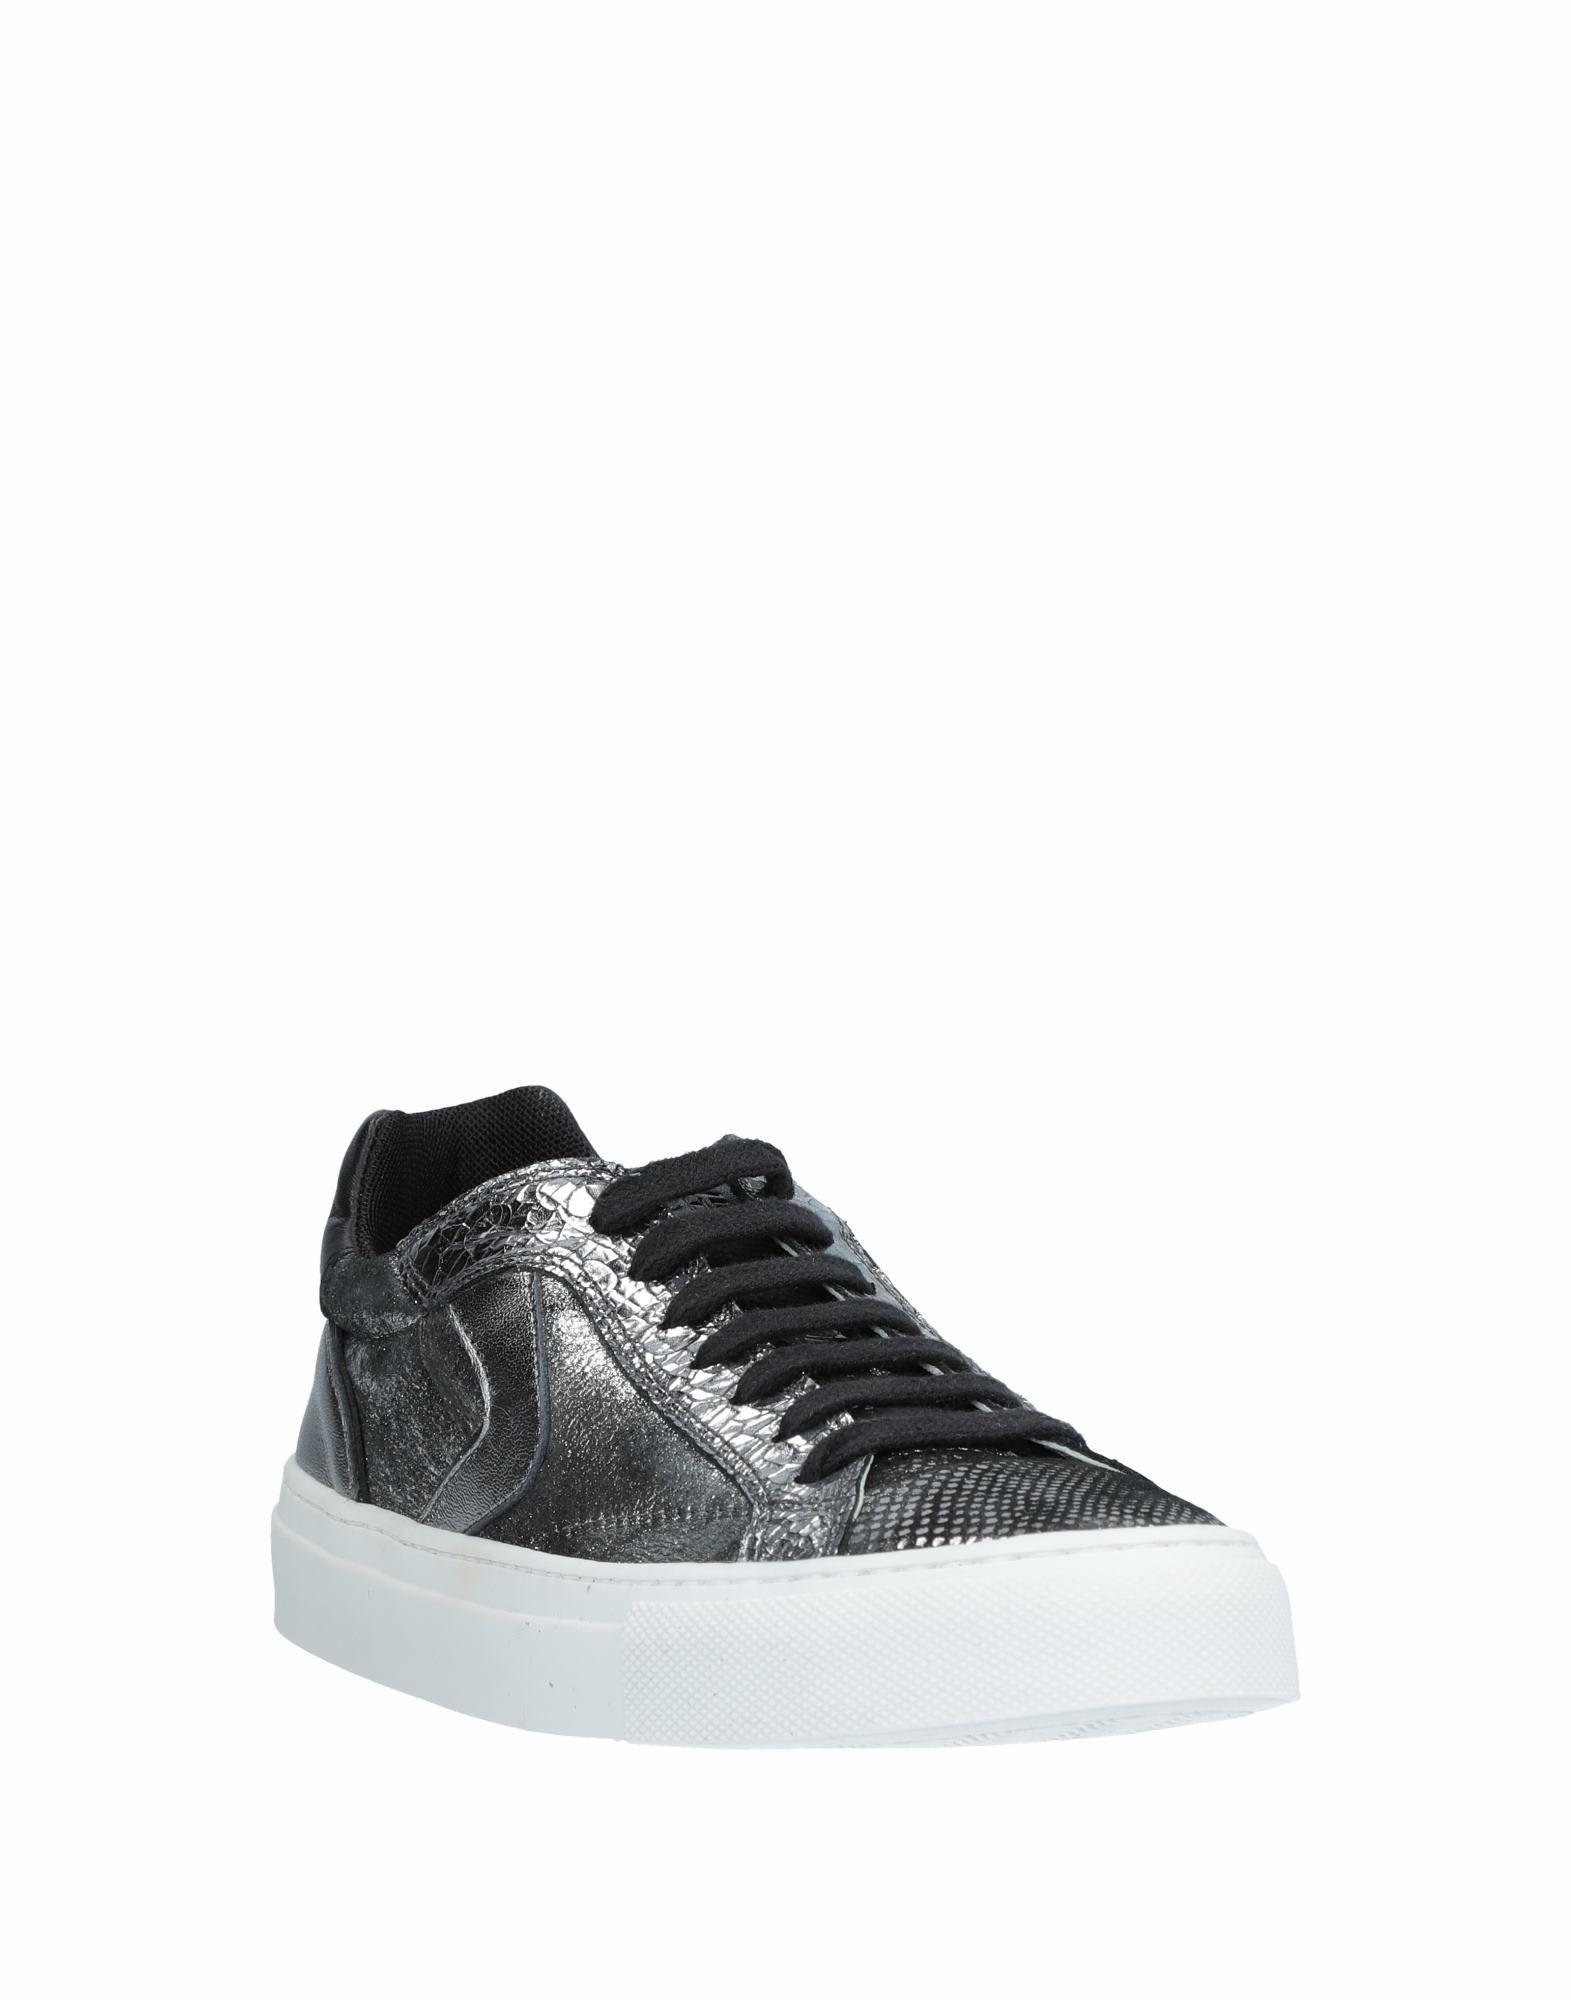 Stilvolle billige Schuhe Voile 11537307VJ Blanche Sneakers Damen  11537307VJ Voile e8d124